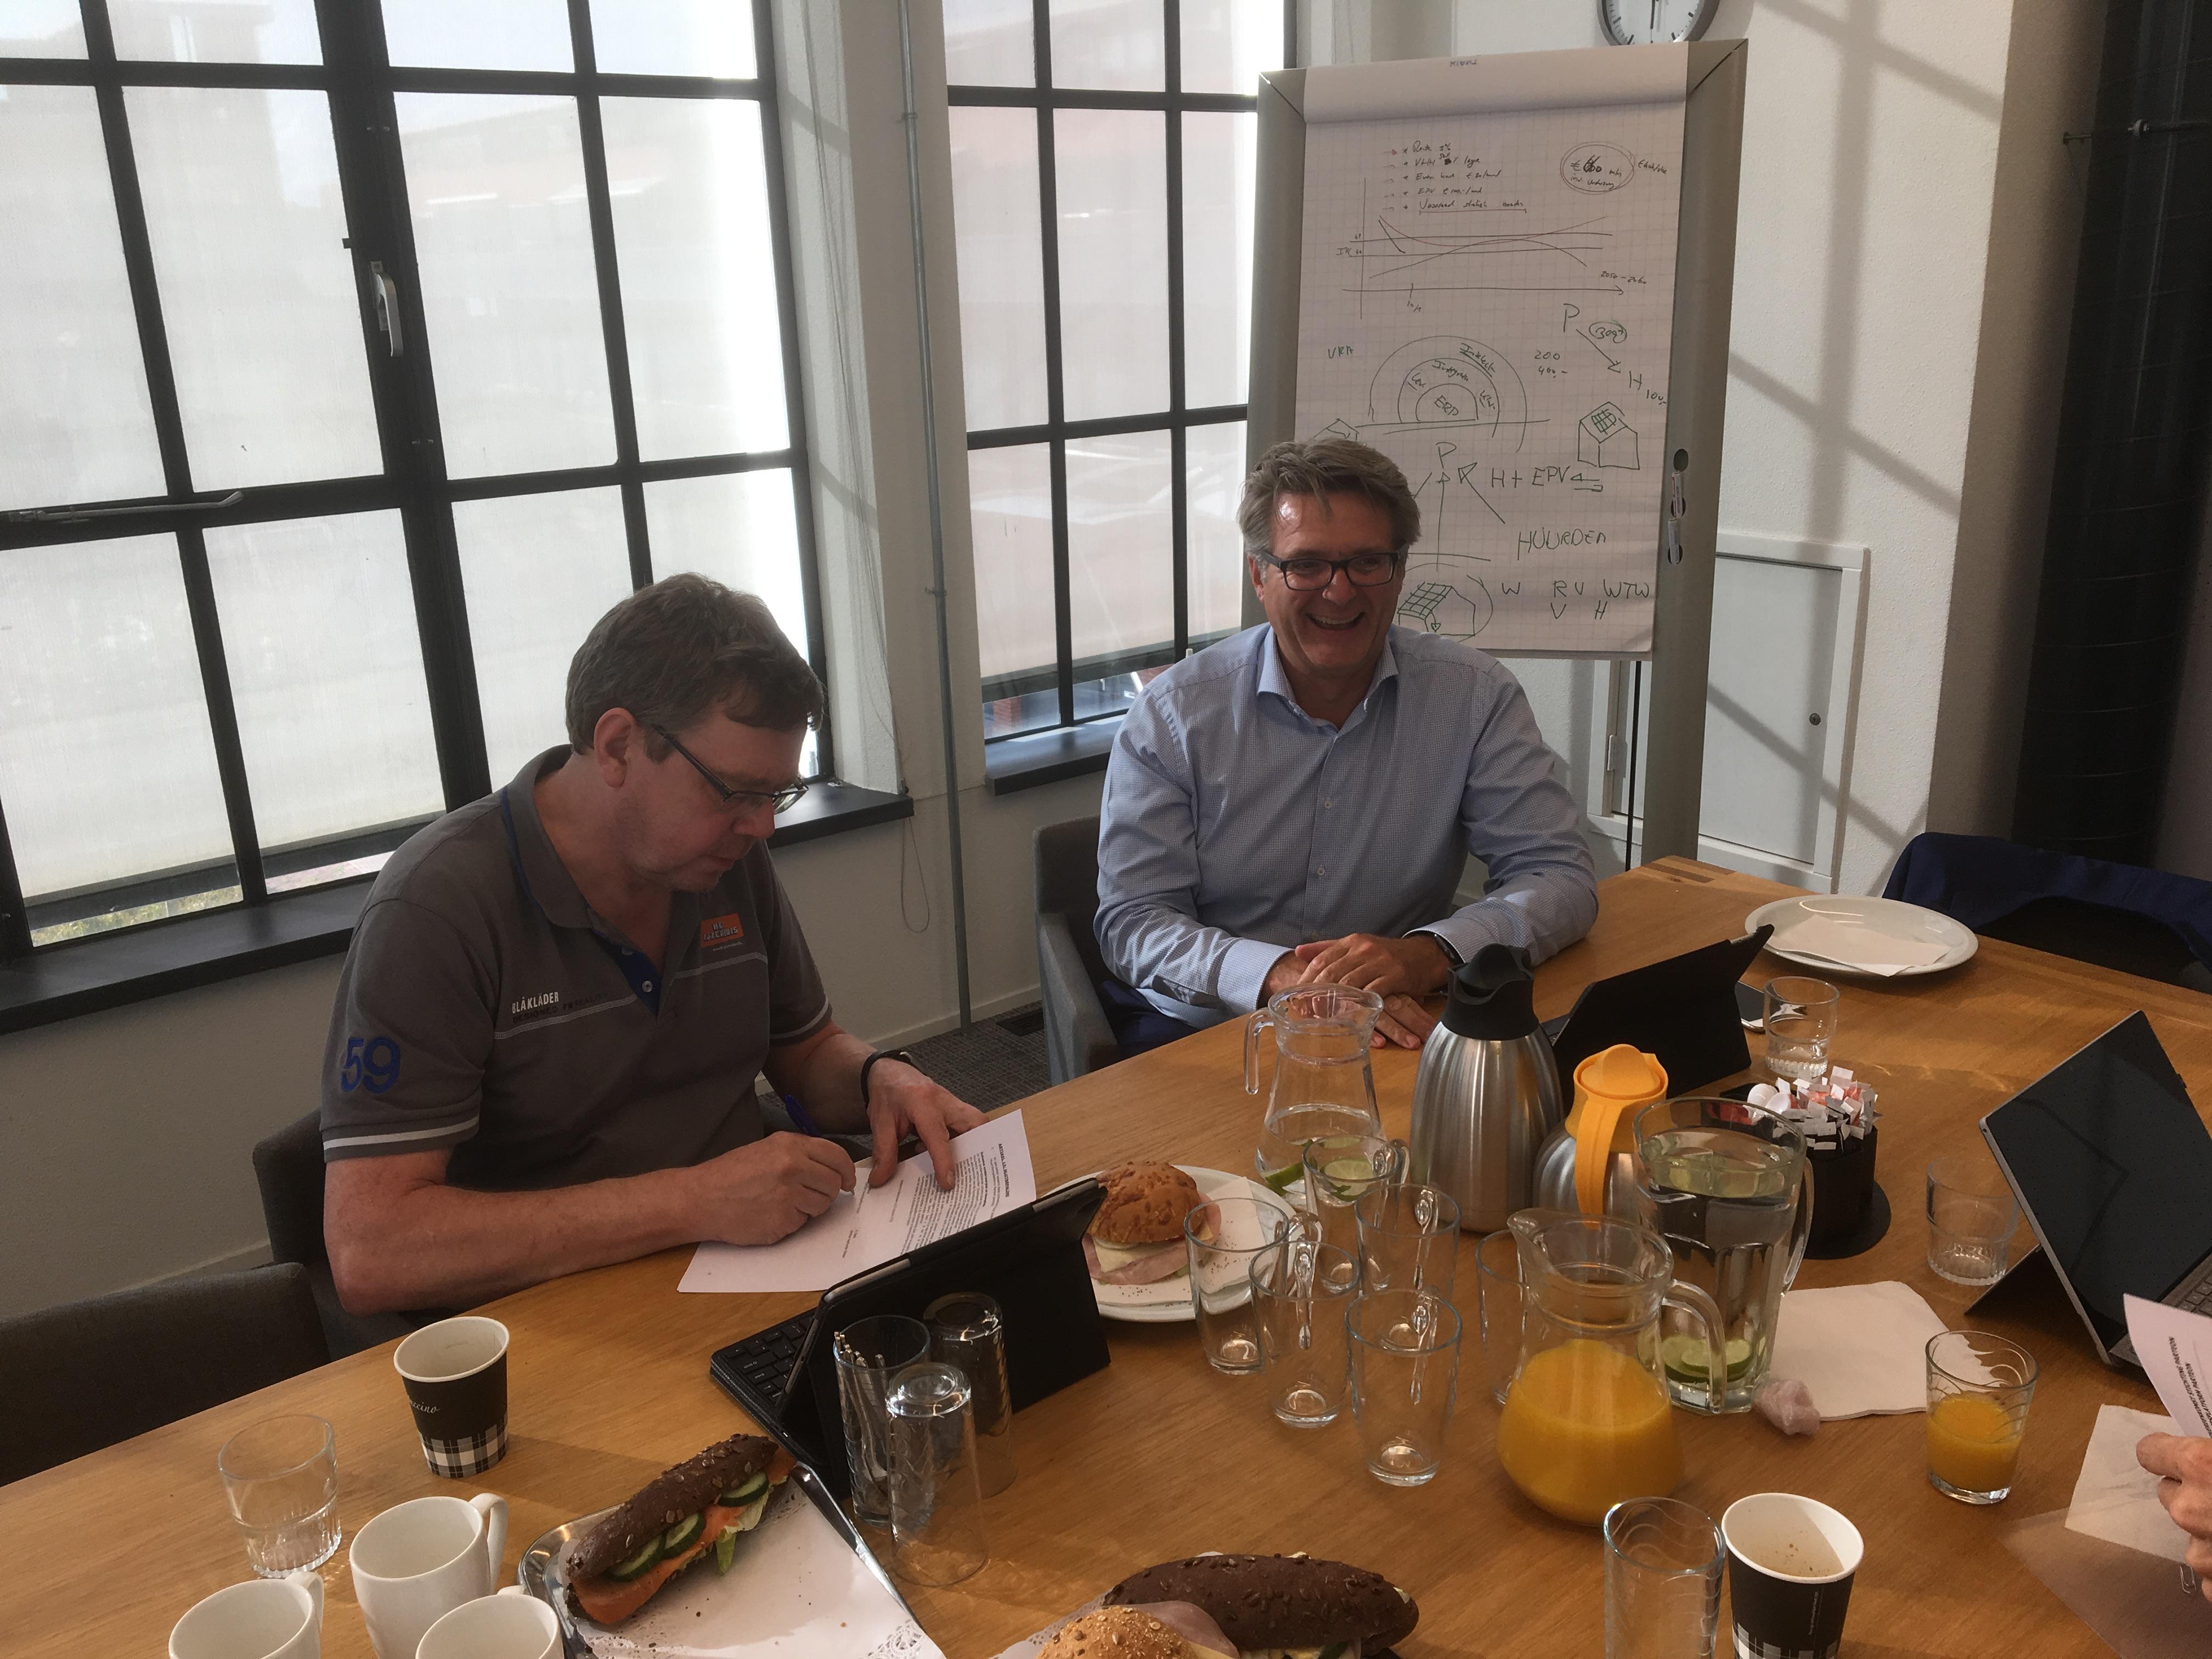 Samenwerkingsovereenkomst Parteon – Huurdersplatform Parteon